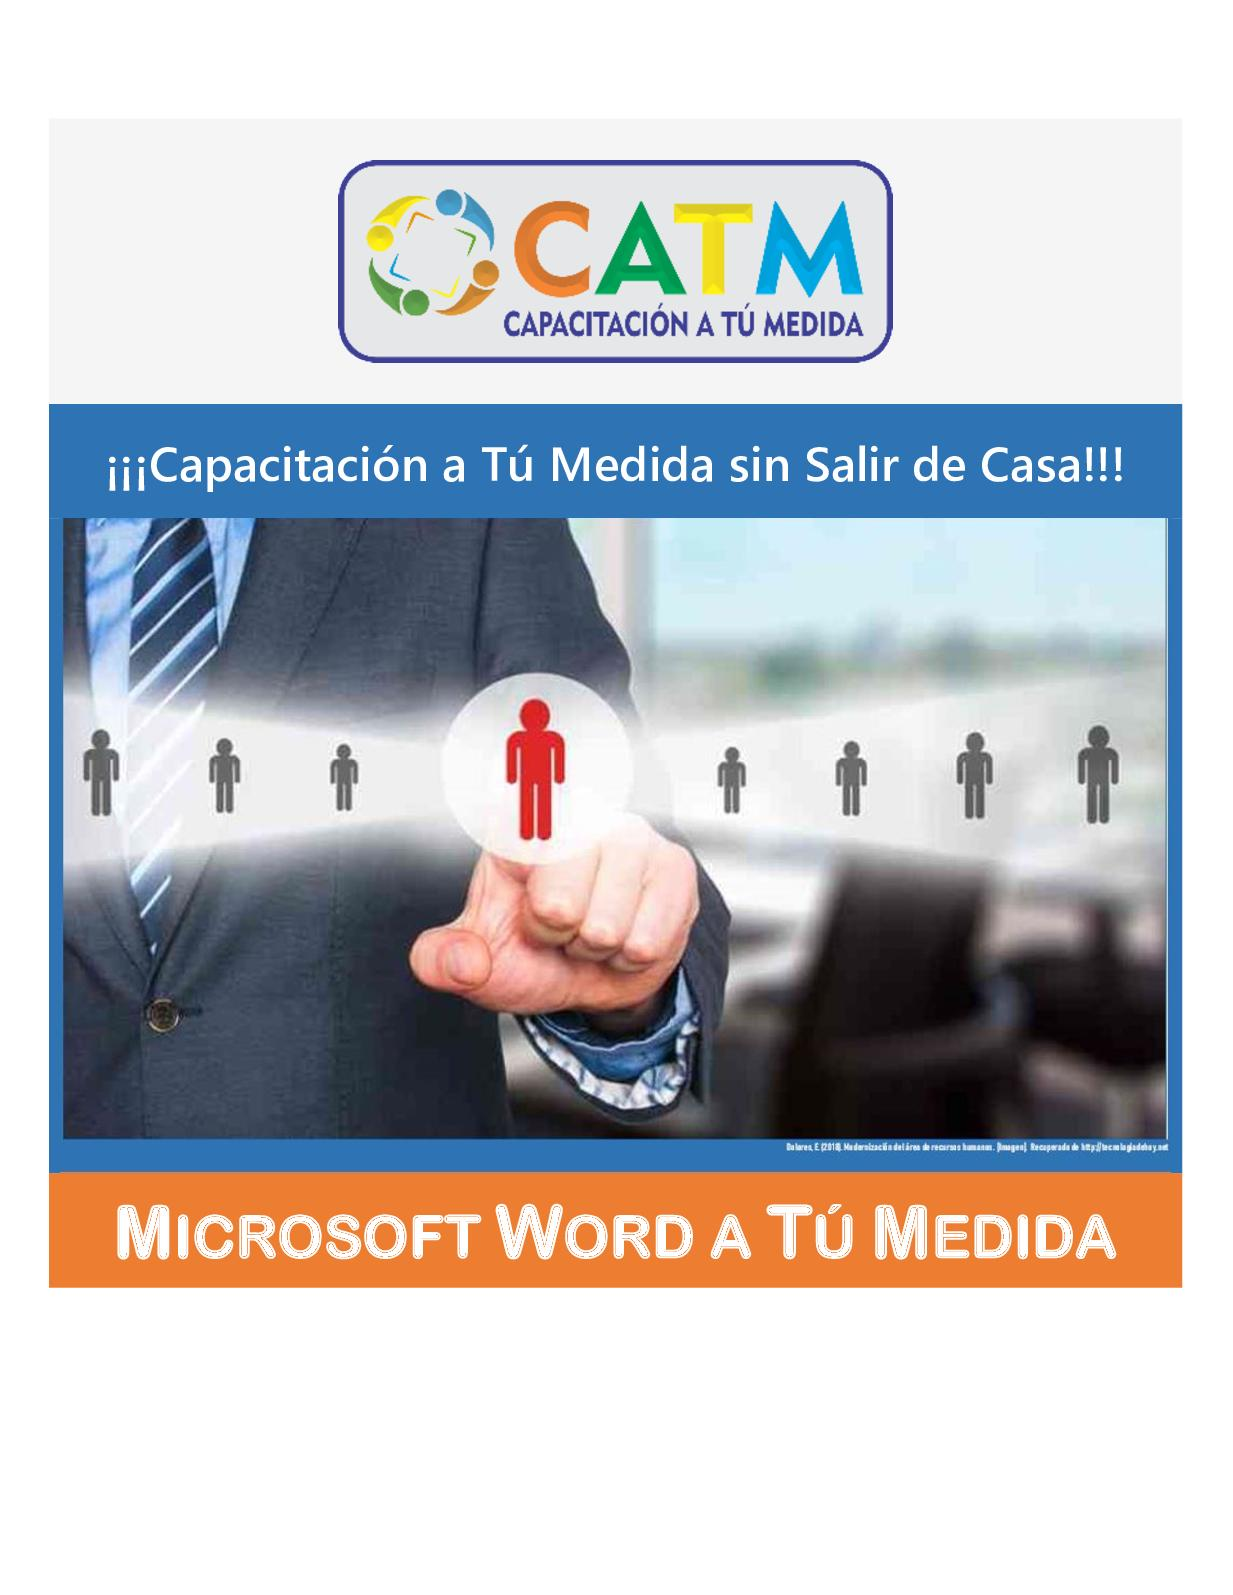 Microsoft Word a Tú Medida